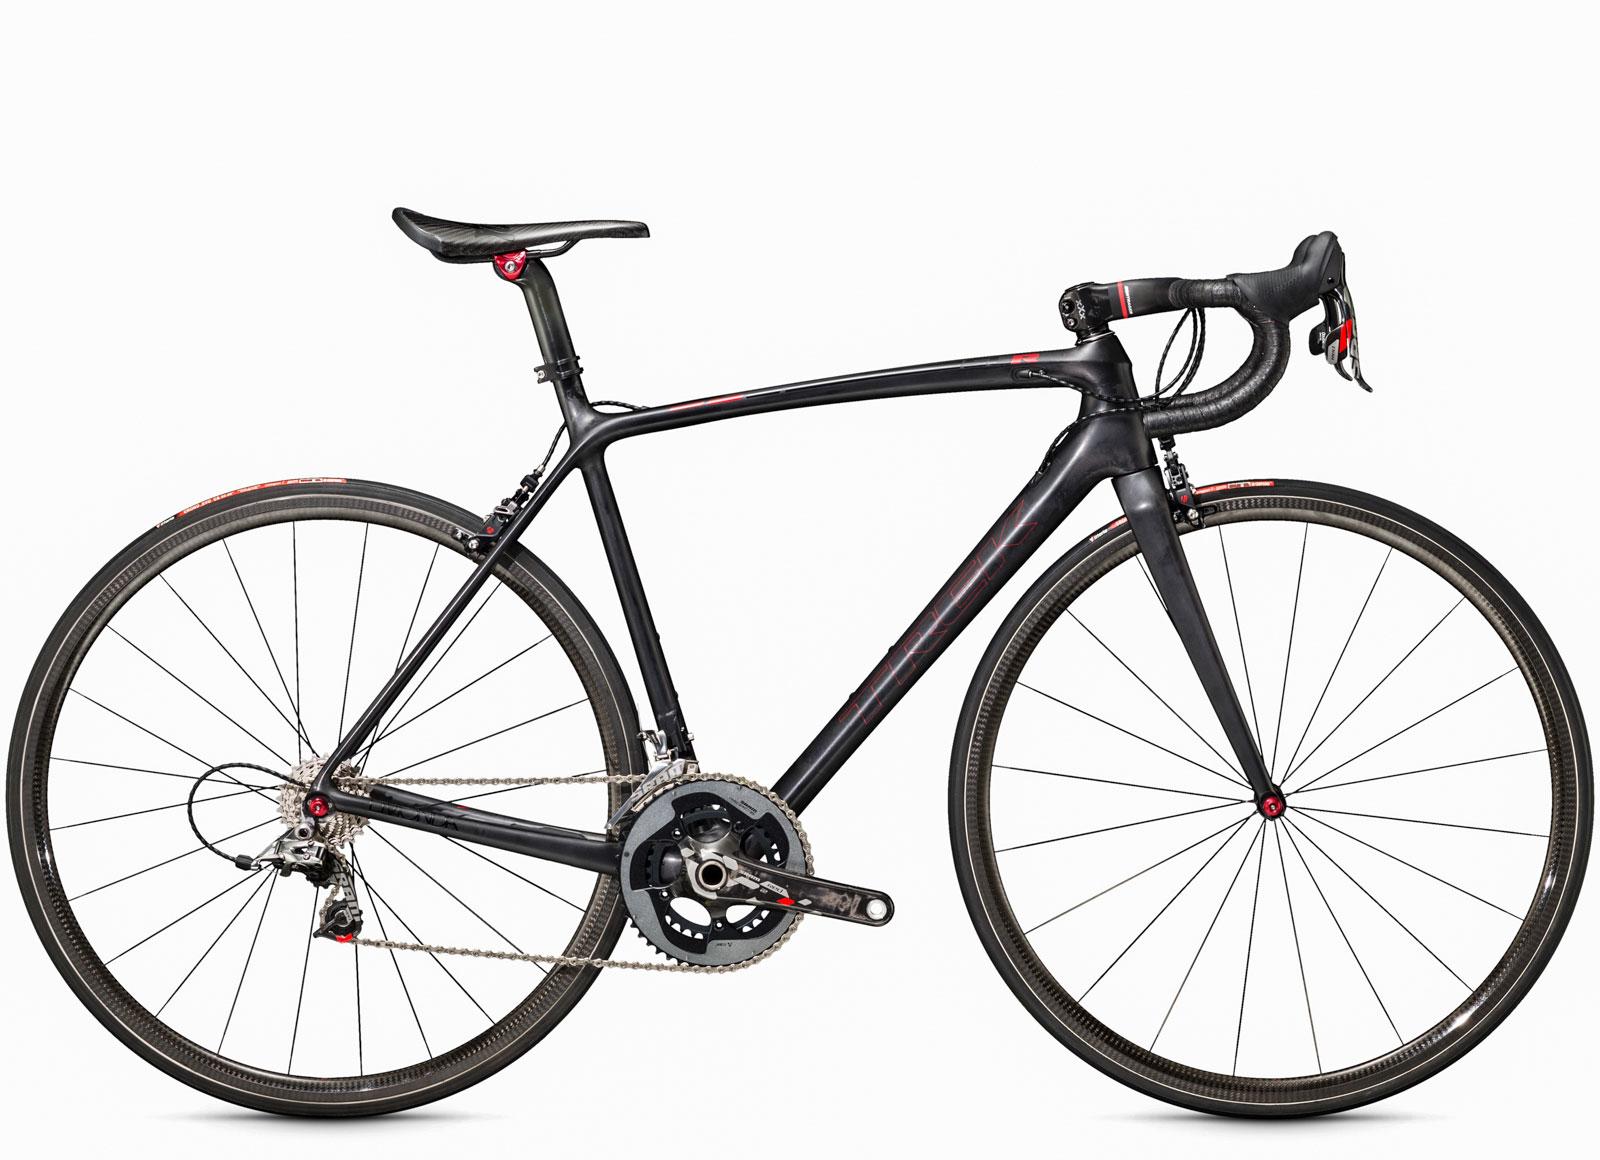 Trek unveils superlight road frame and bike, the Émonda